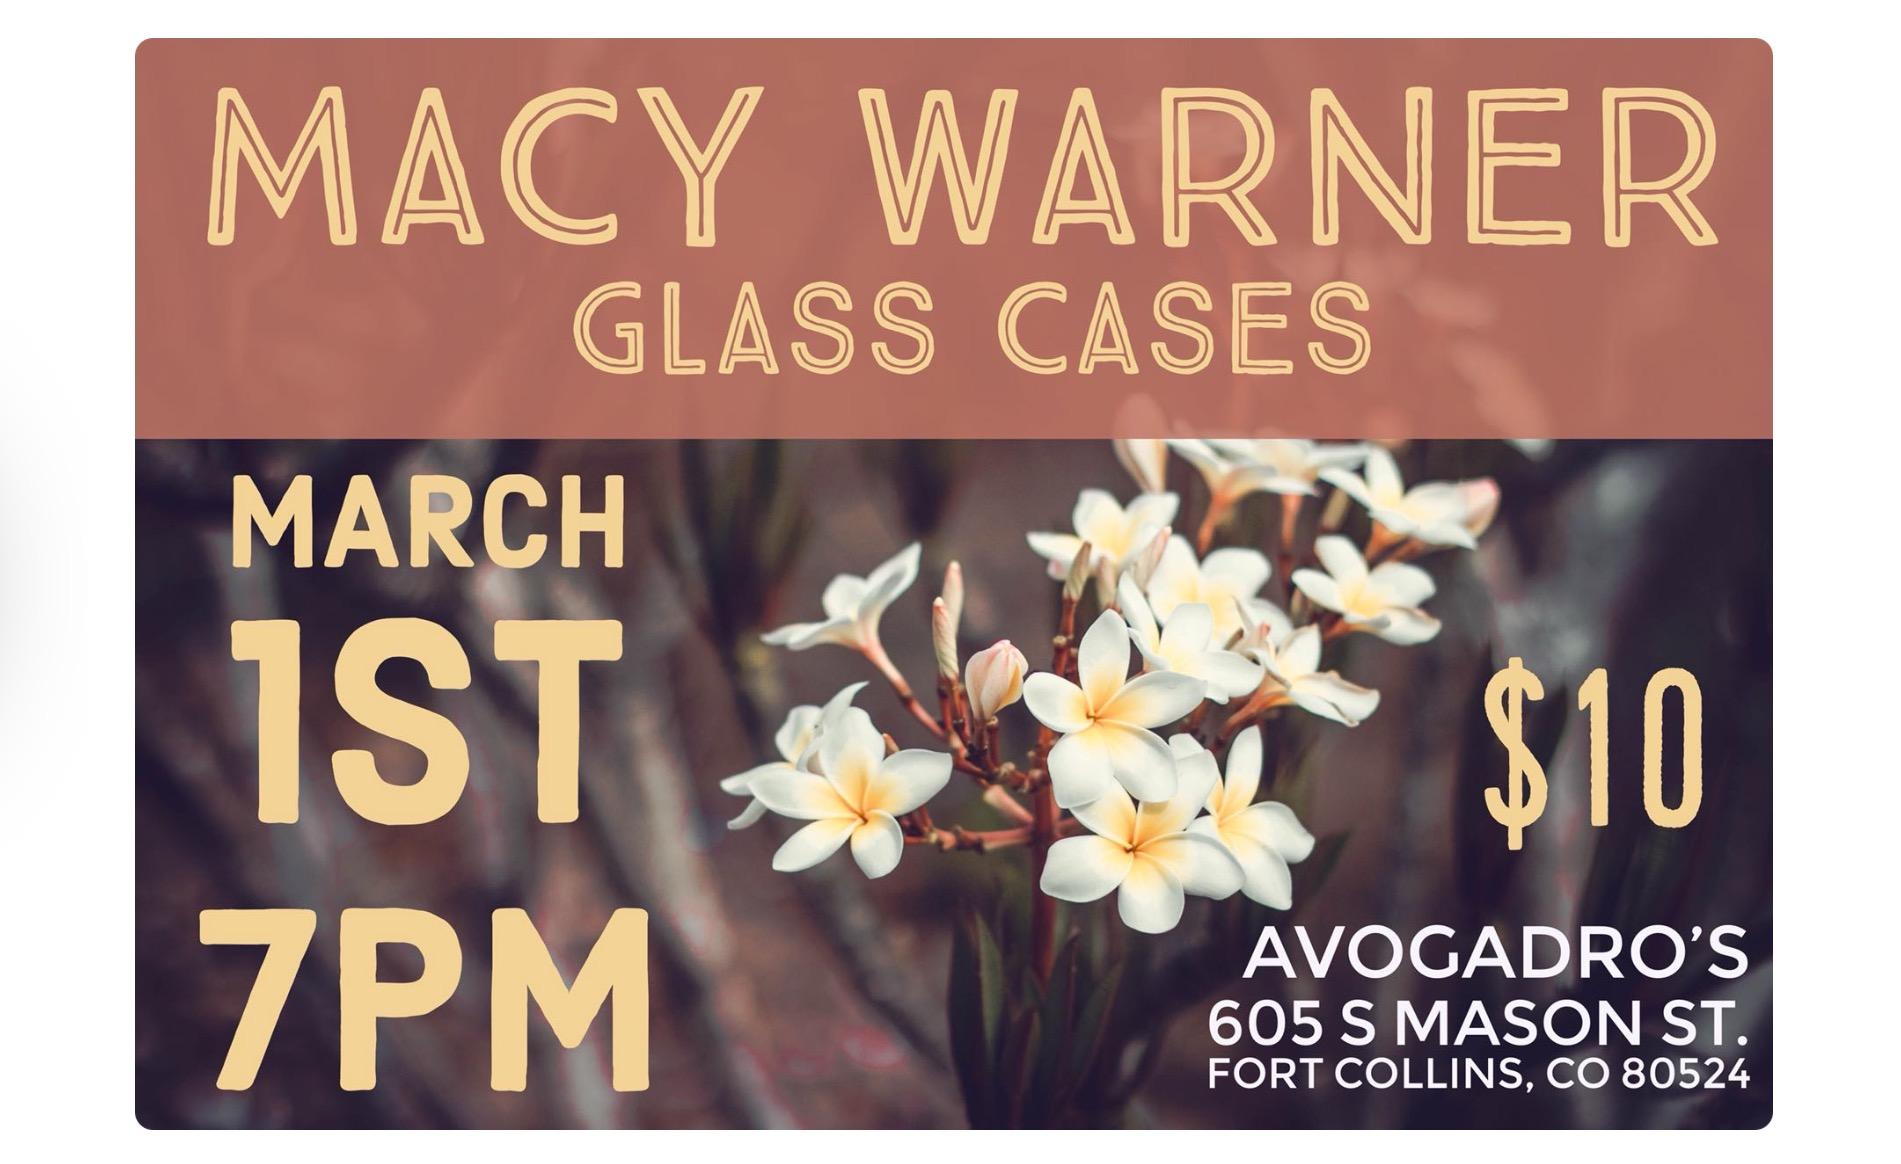 MACY WARNER GLASS CASES